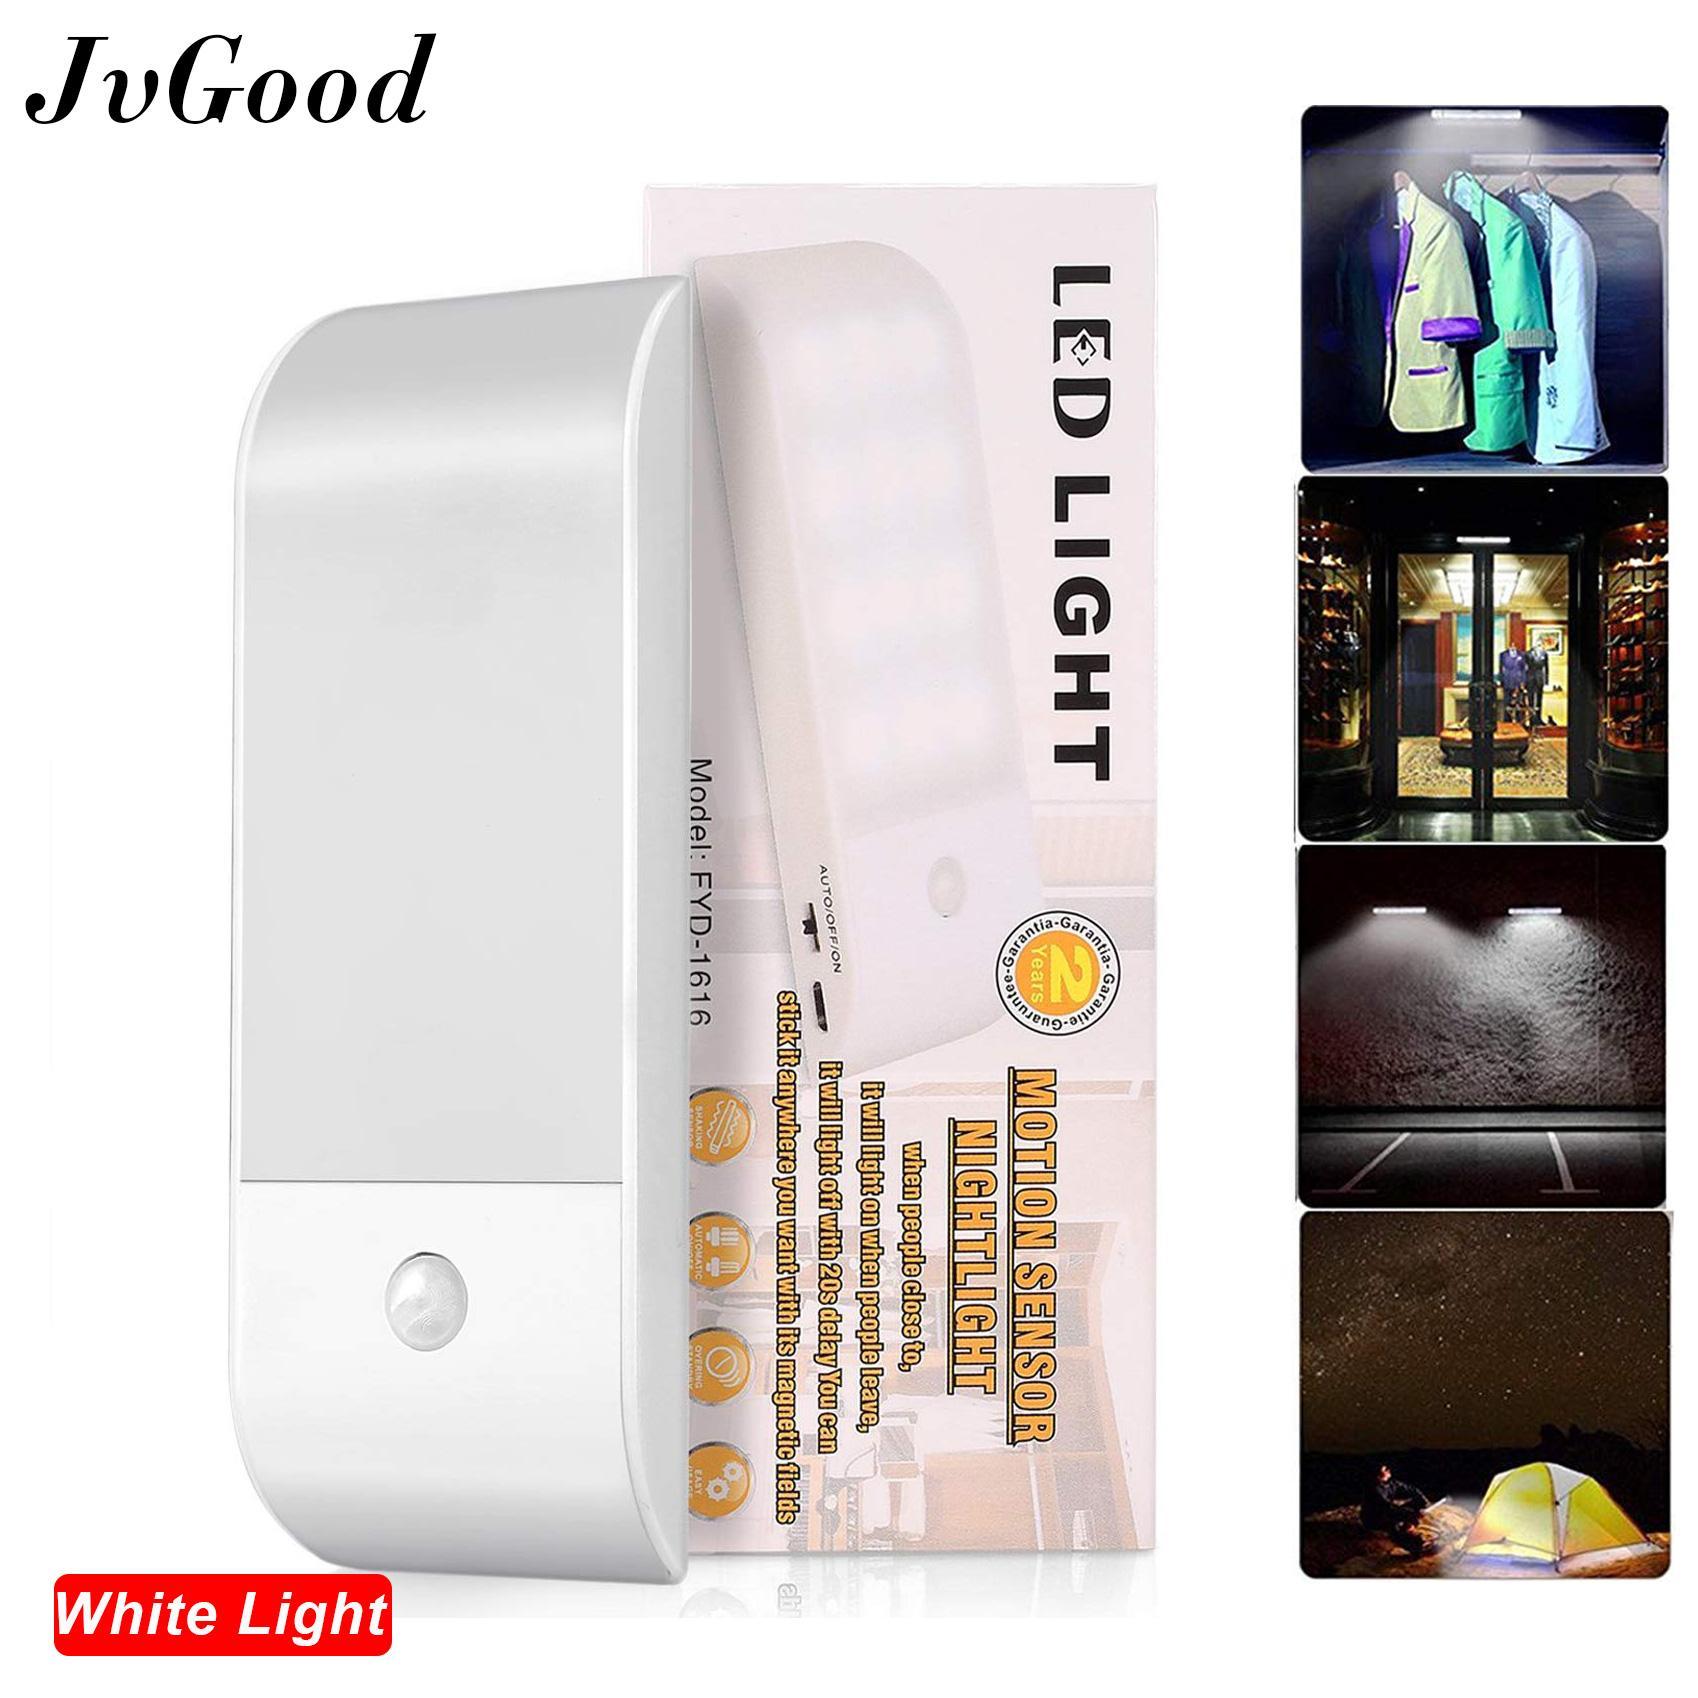 64dbfb45a1c5 JvGood Motion Sensor Night Lights, Licer LED Body Toilet Bathroom Corridor  Lamp 12 LEDs USB